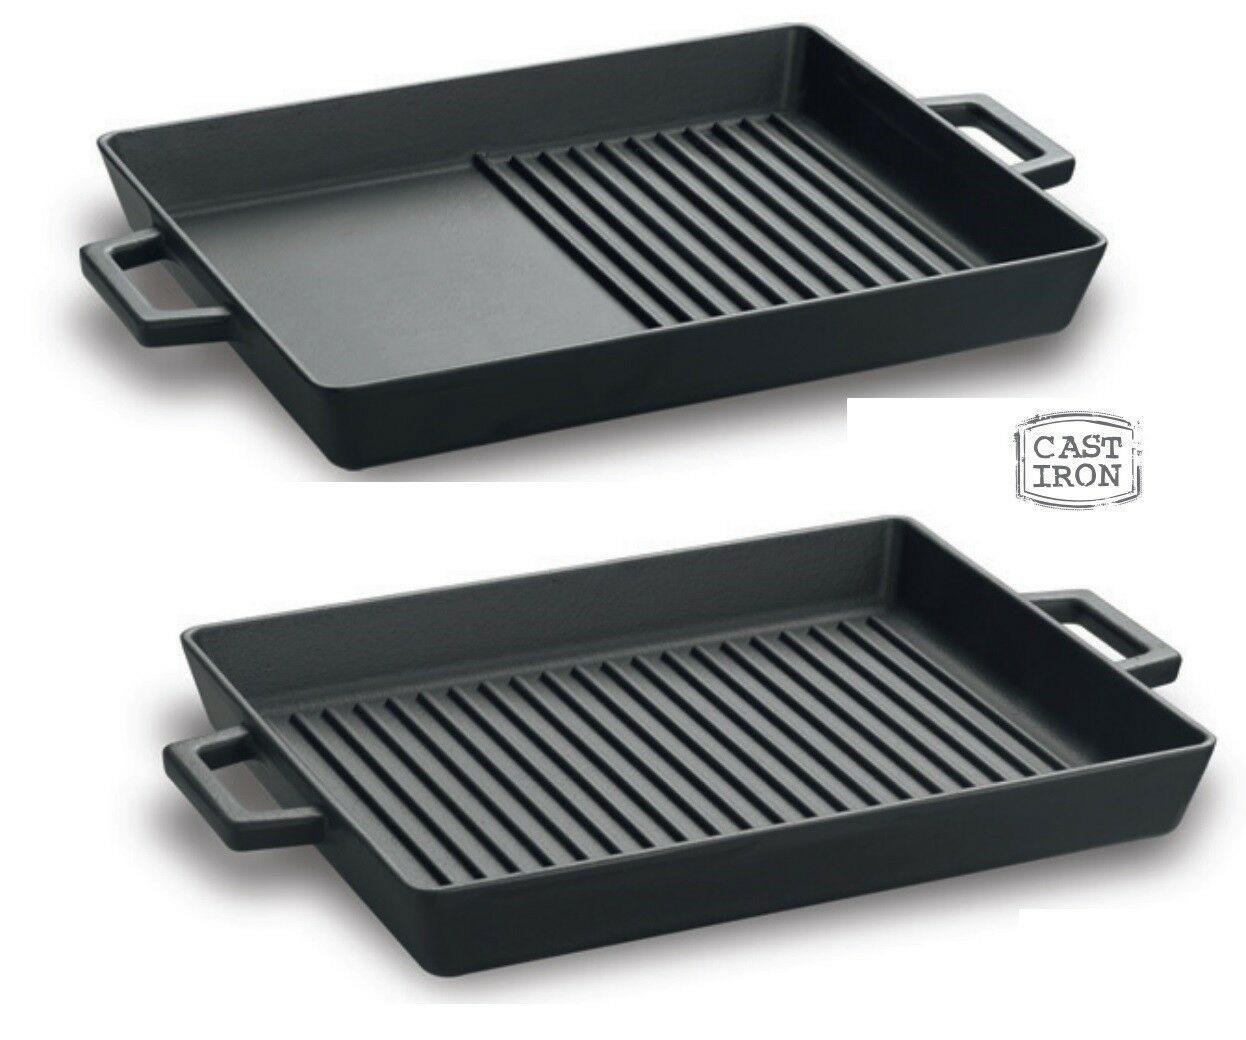 Https Ift Tt 33eq76h Grill Pans Ideas Of Grill Pans Grillpans Lava Signature Enameled Cast Iron Stove To Cast Iron Stove Grill Pan Stove Top Griddle